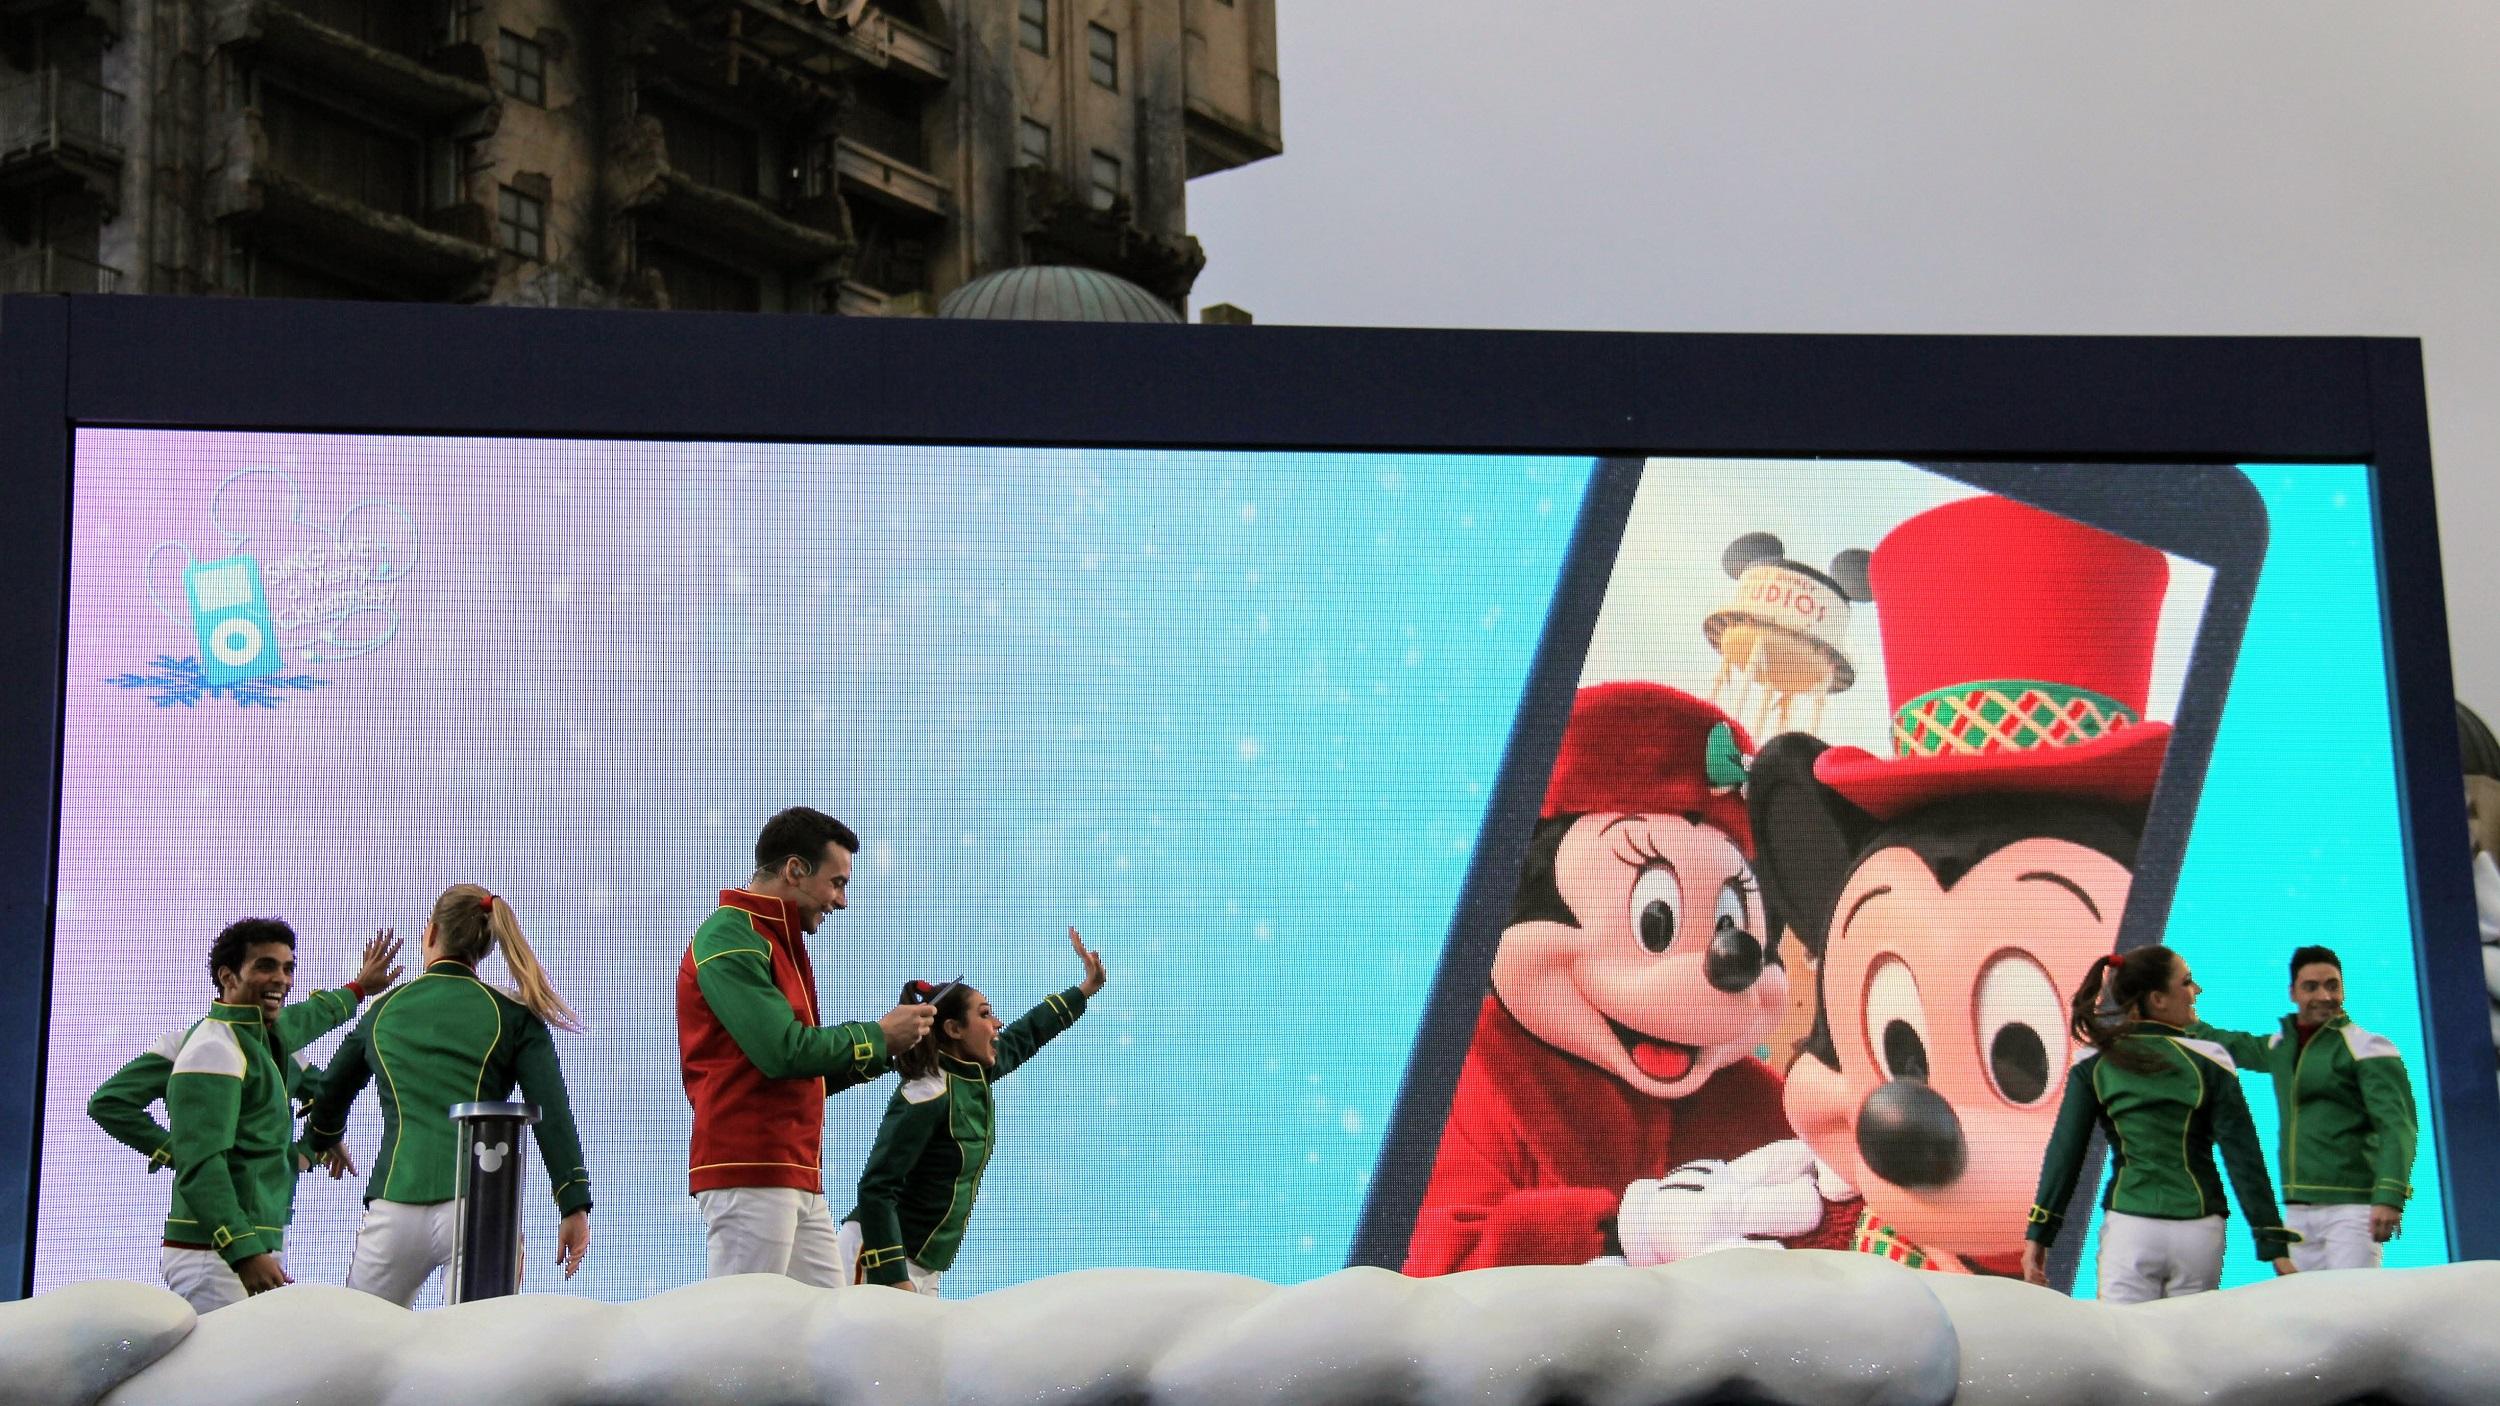 Disneyland Parijs - Kerst 2017 - Siing me a Merry Christmas